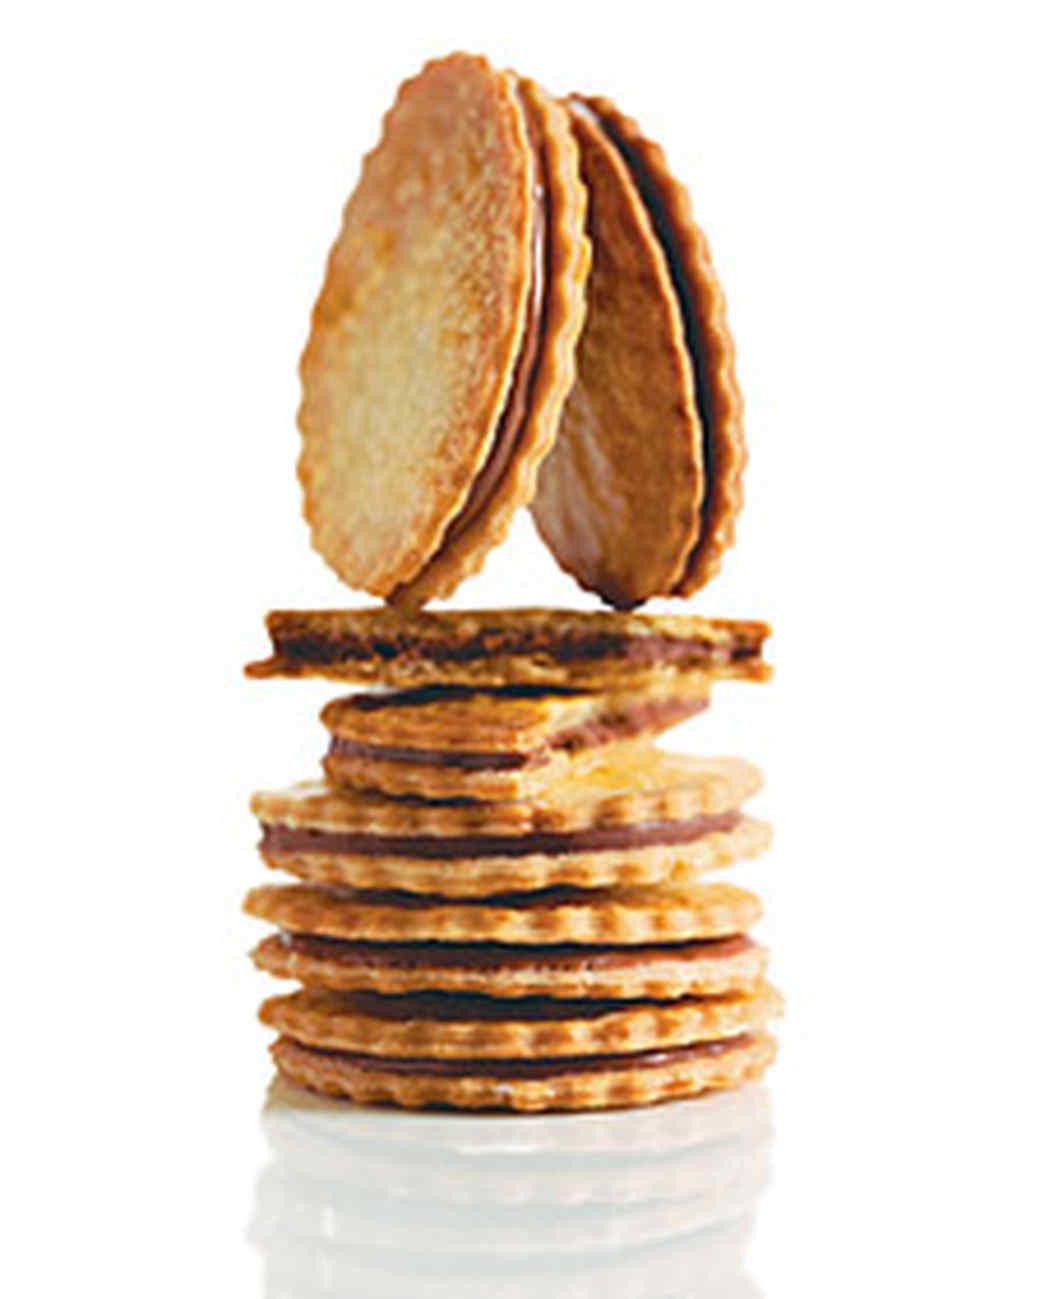 mld102246_0607_biscuits.jpg